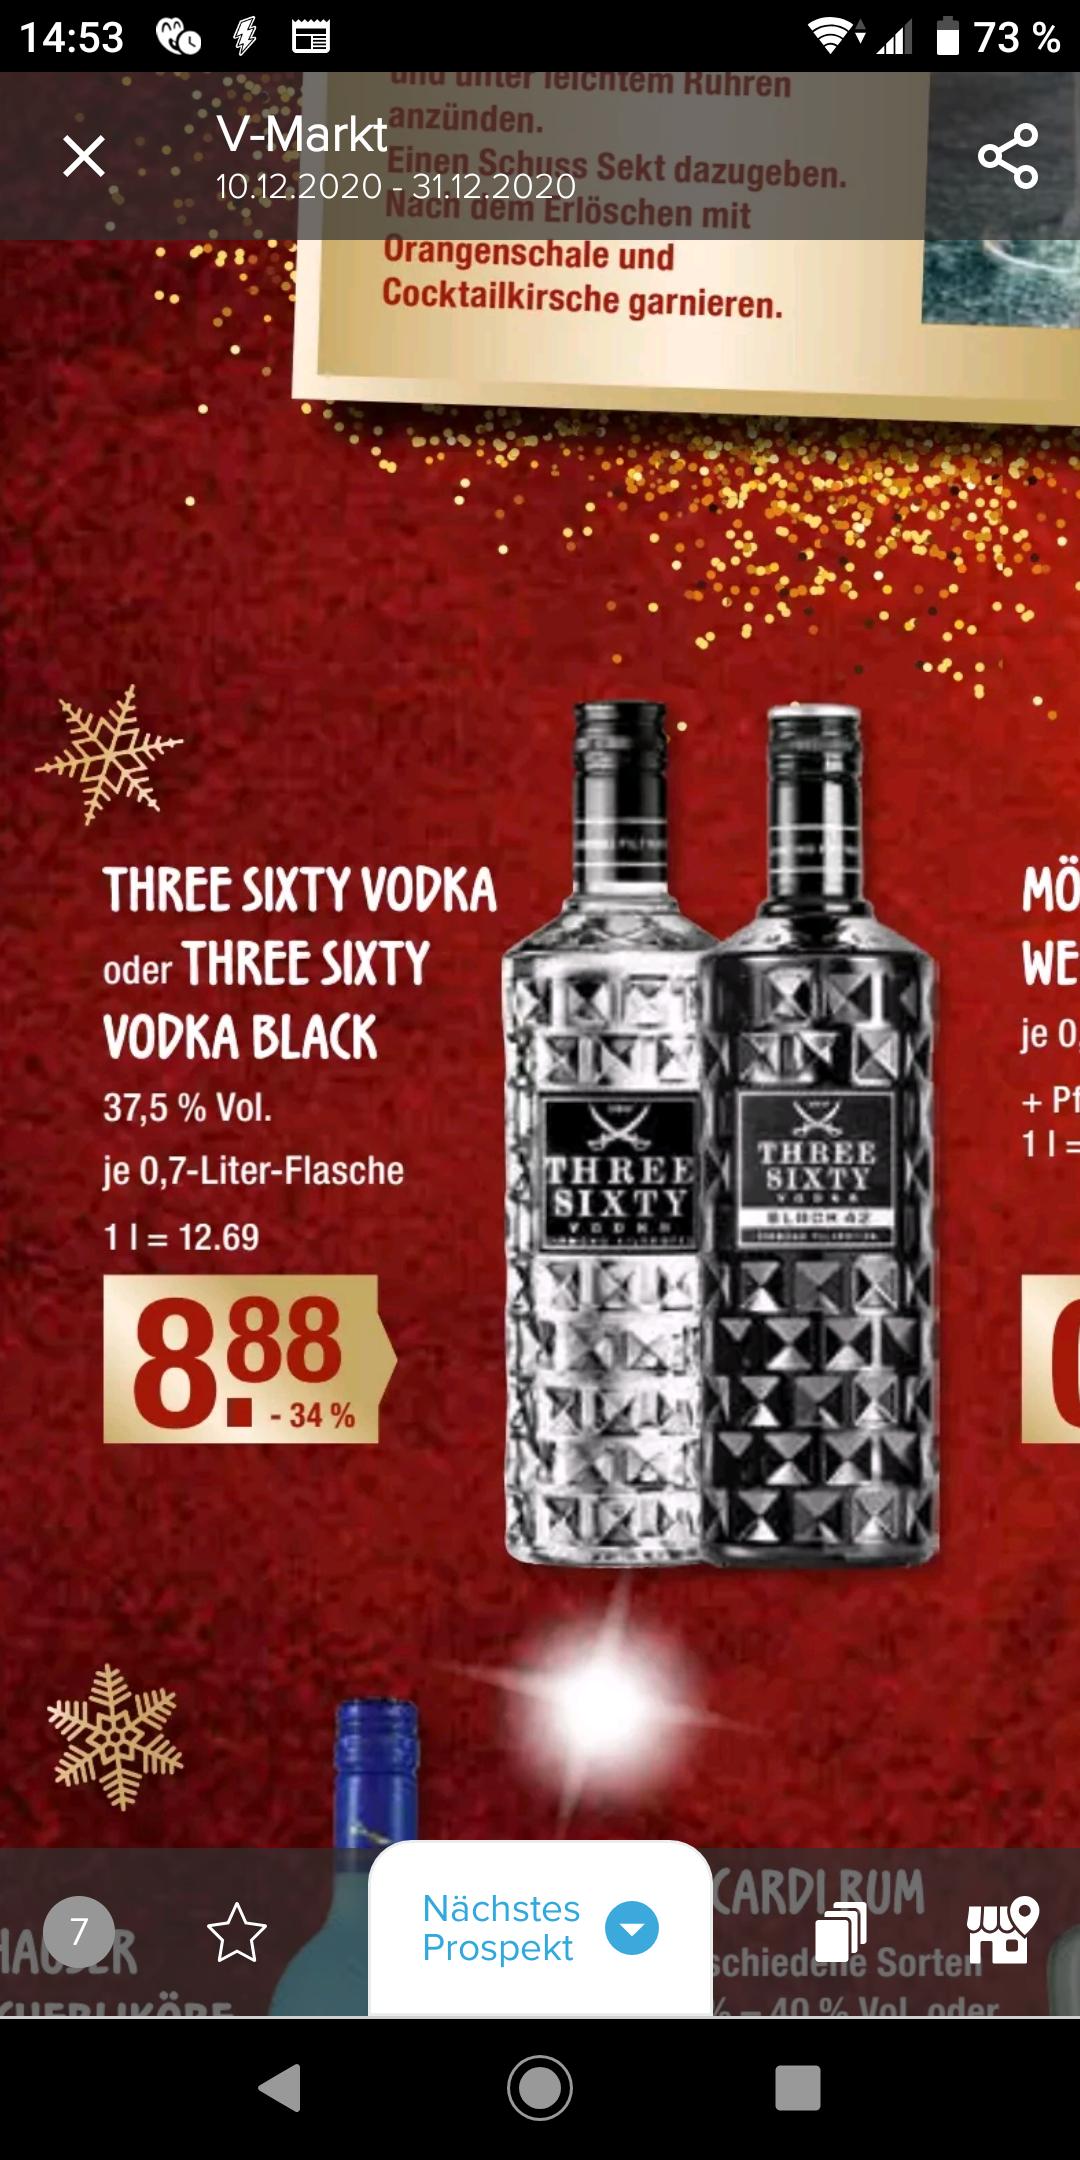 (lokal) Vmarkt - Three Sixty Vodka 0,7l Normal und Black 8,88€